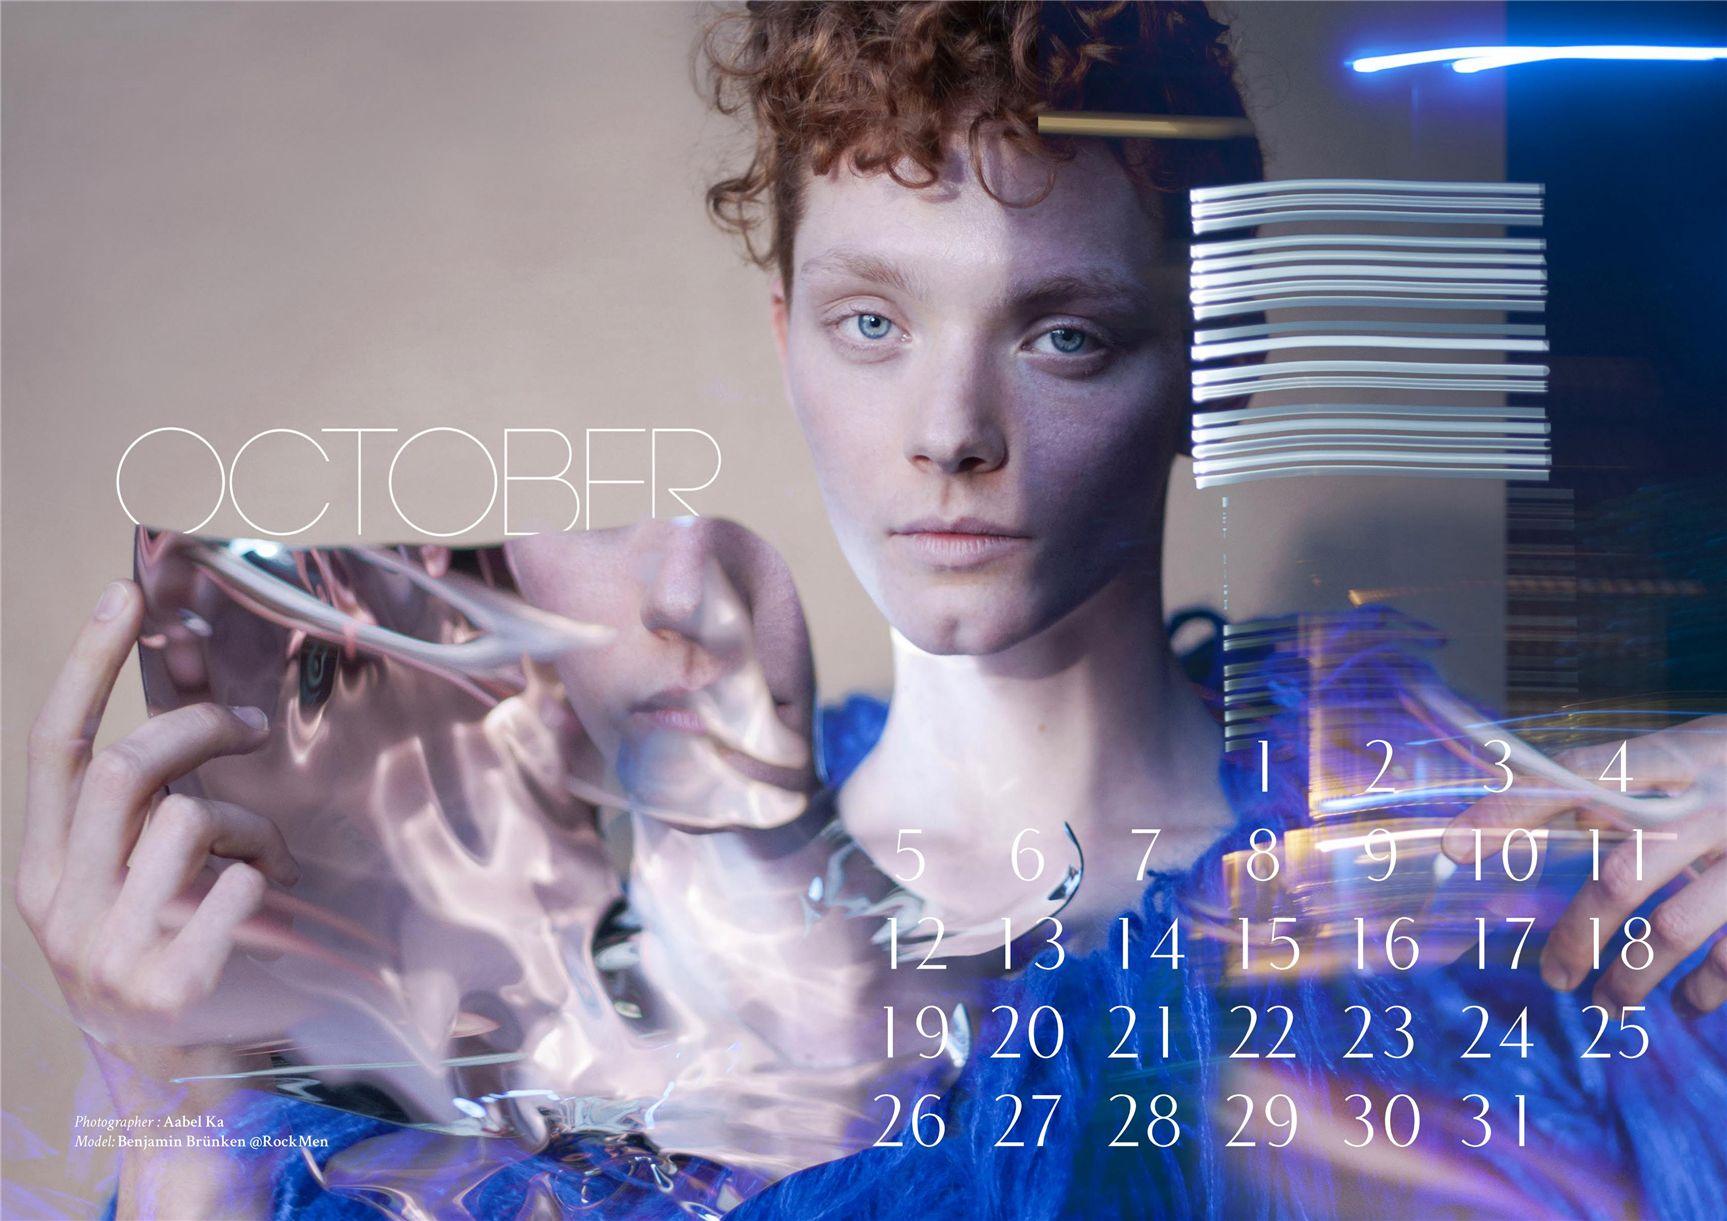 модно-артистический календарь журнала Bizart 2015 calendar - Benjamin Brunken by Aabel Ka